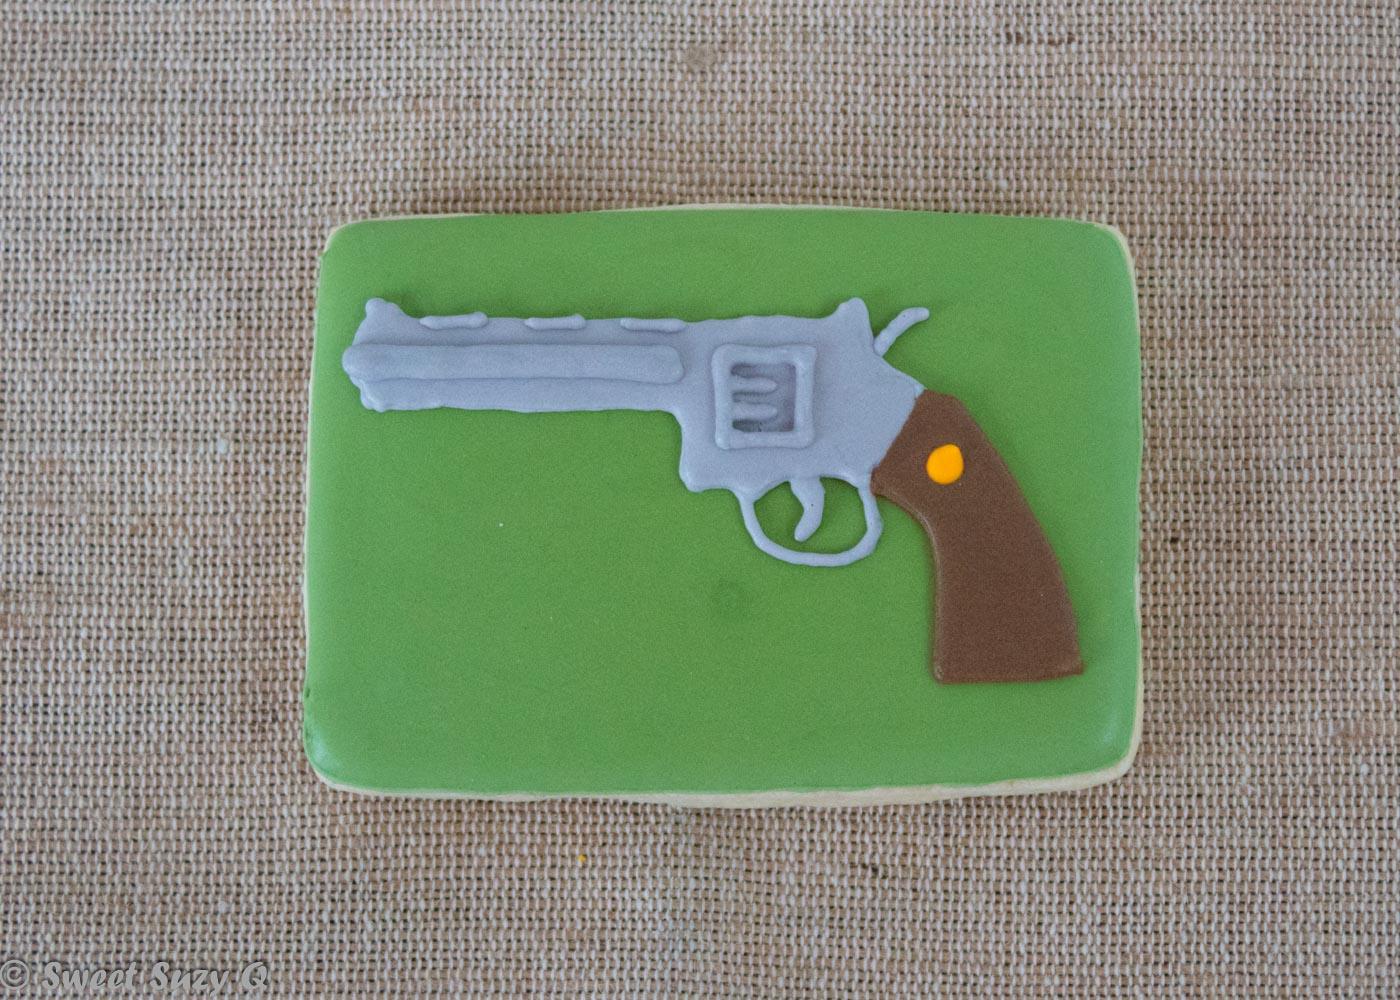 Rick's gun